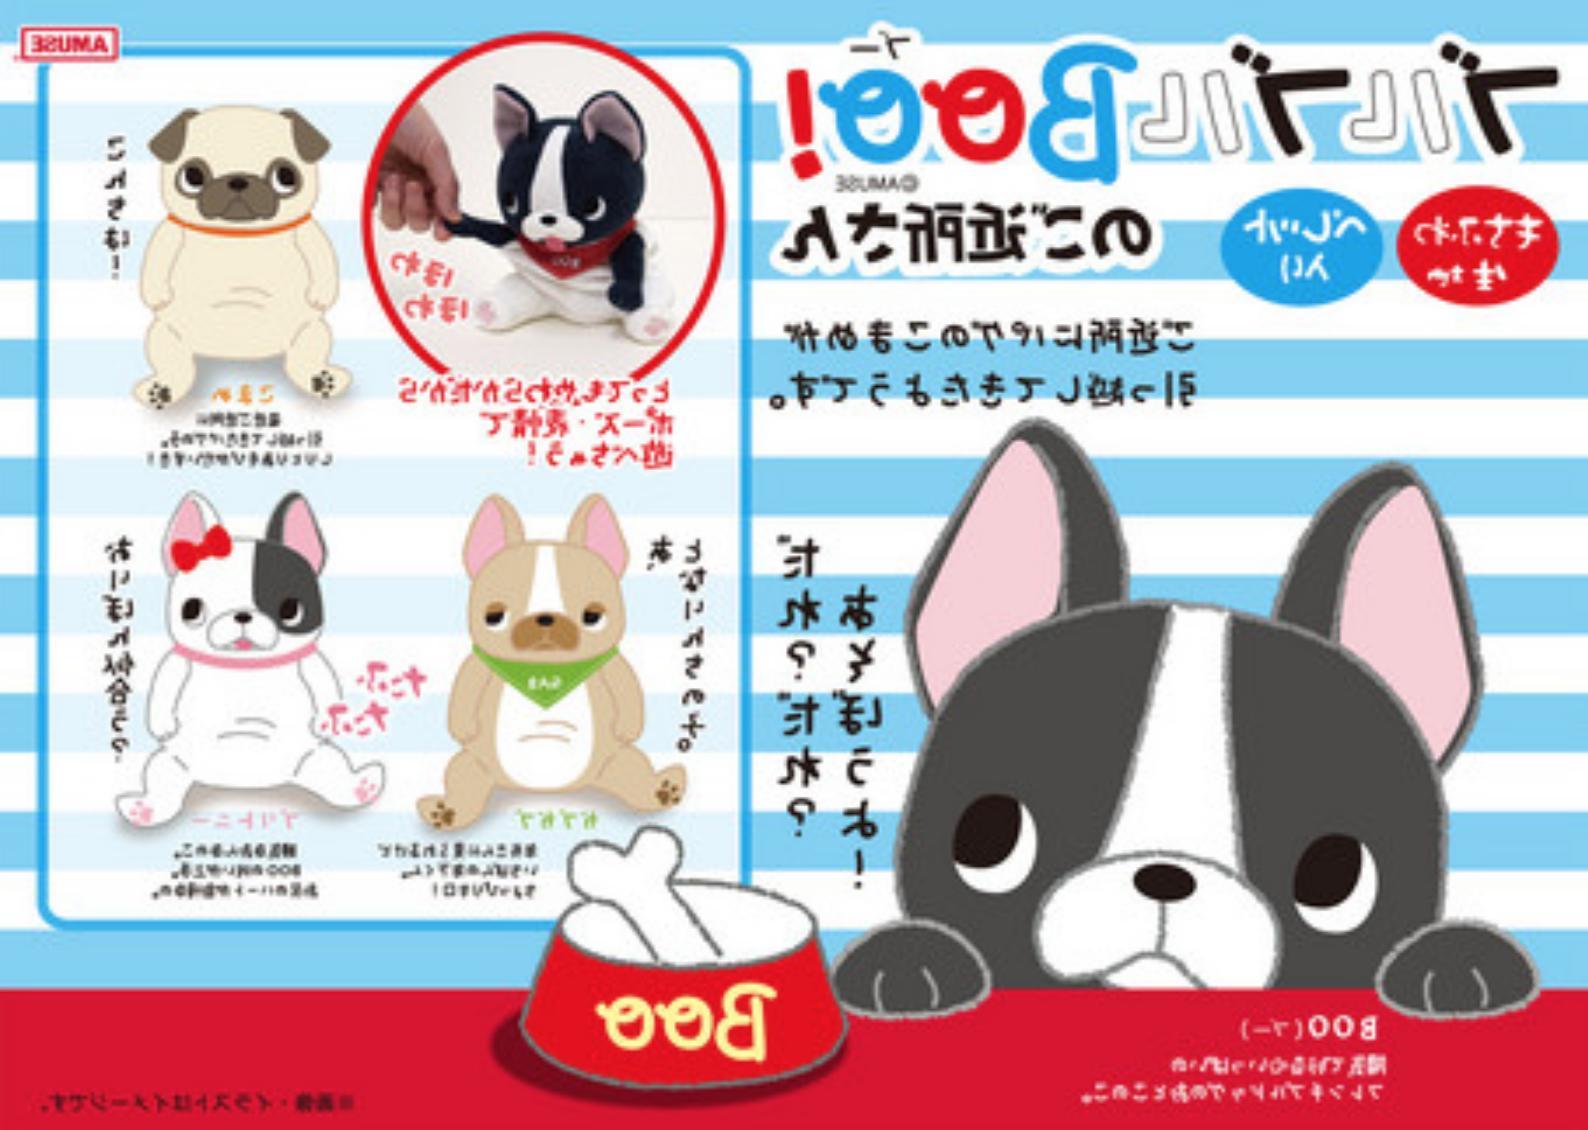 Japan Boo French Bulldog Neighbors